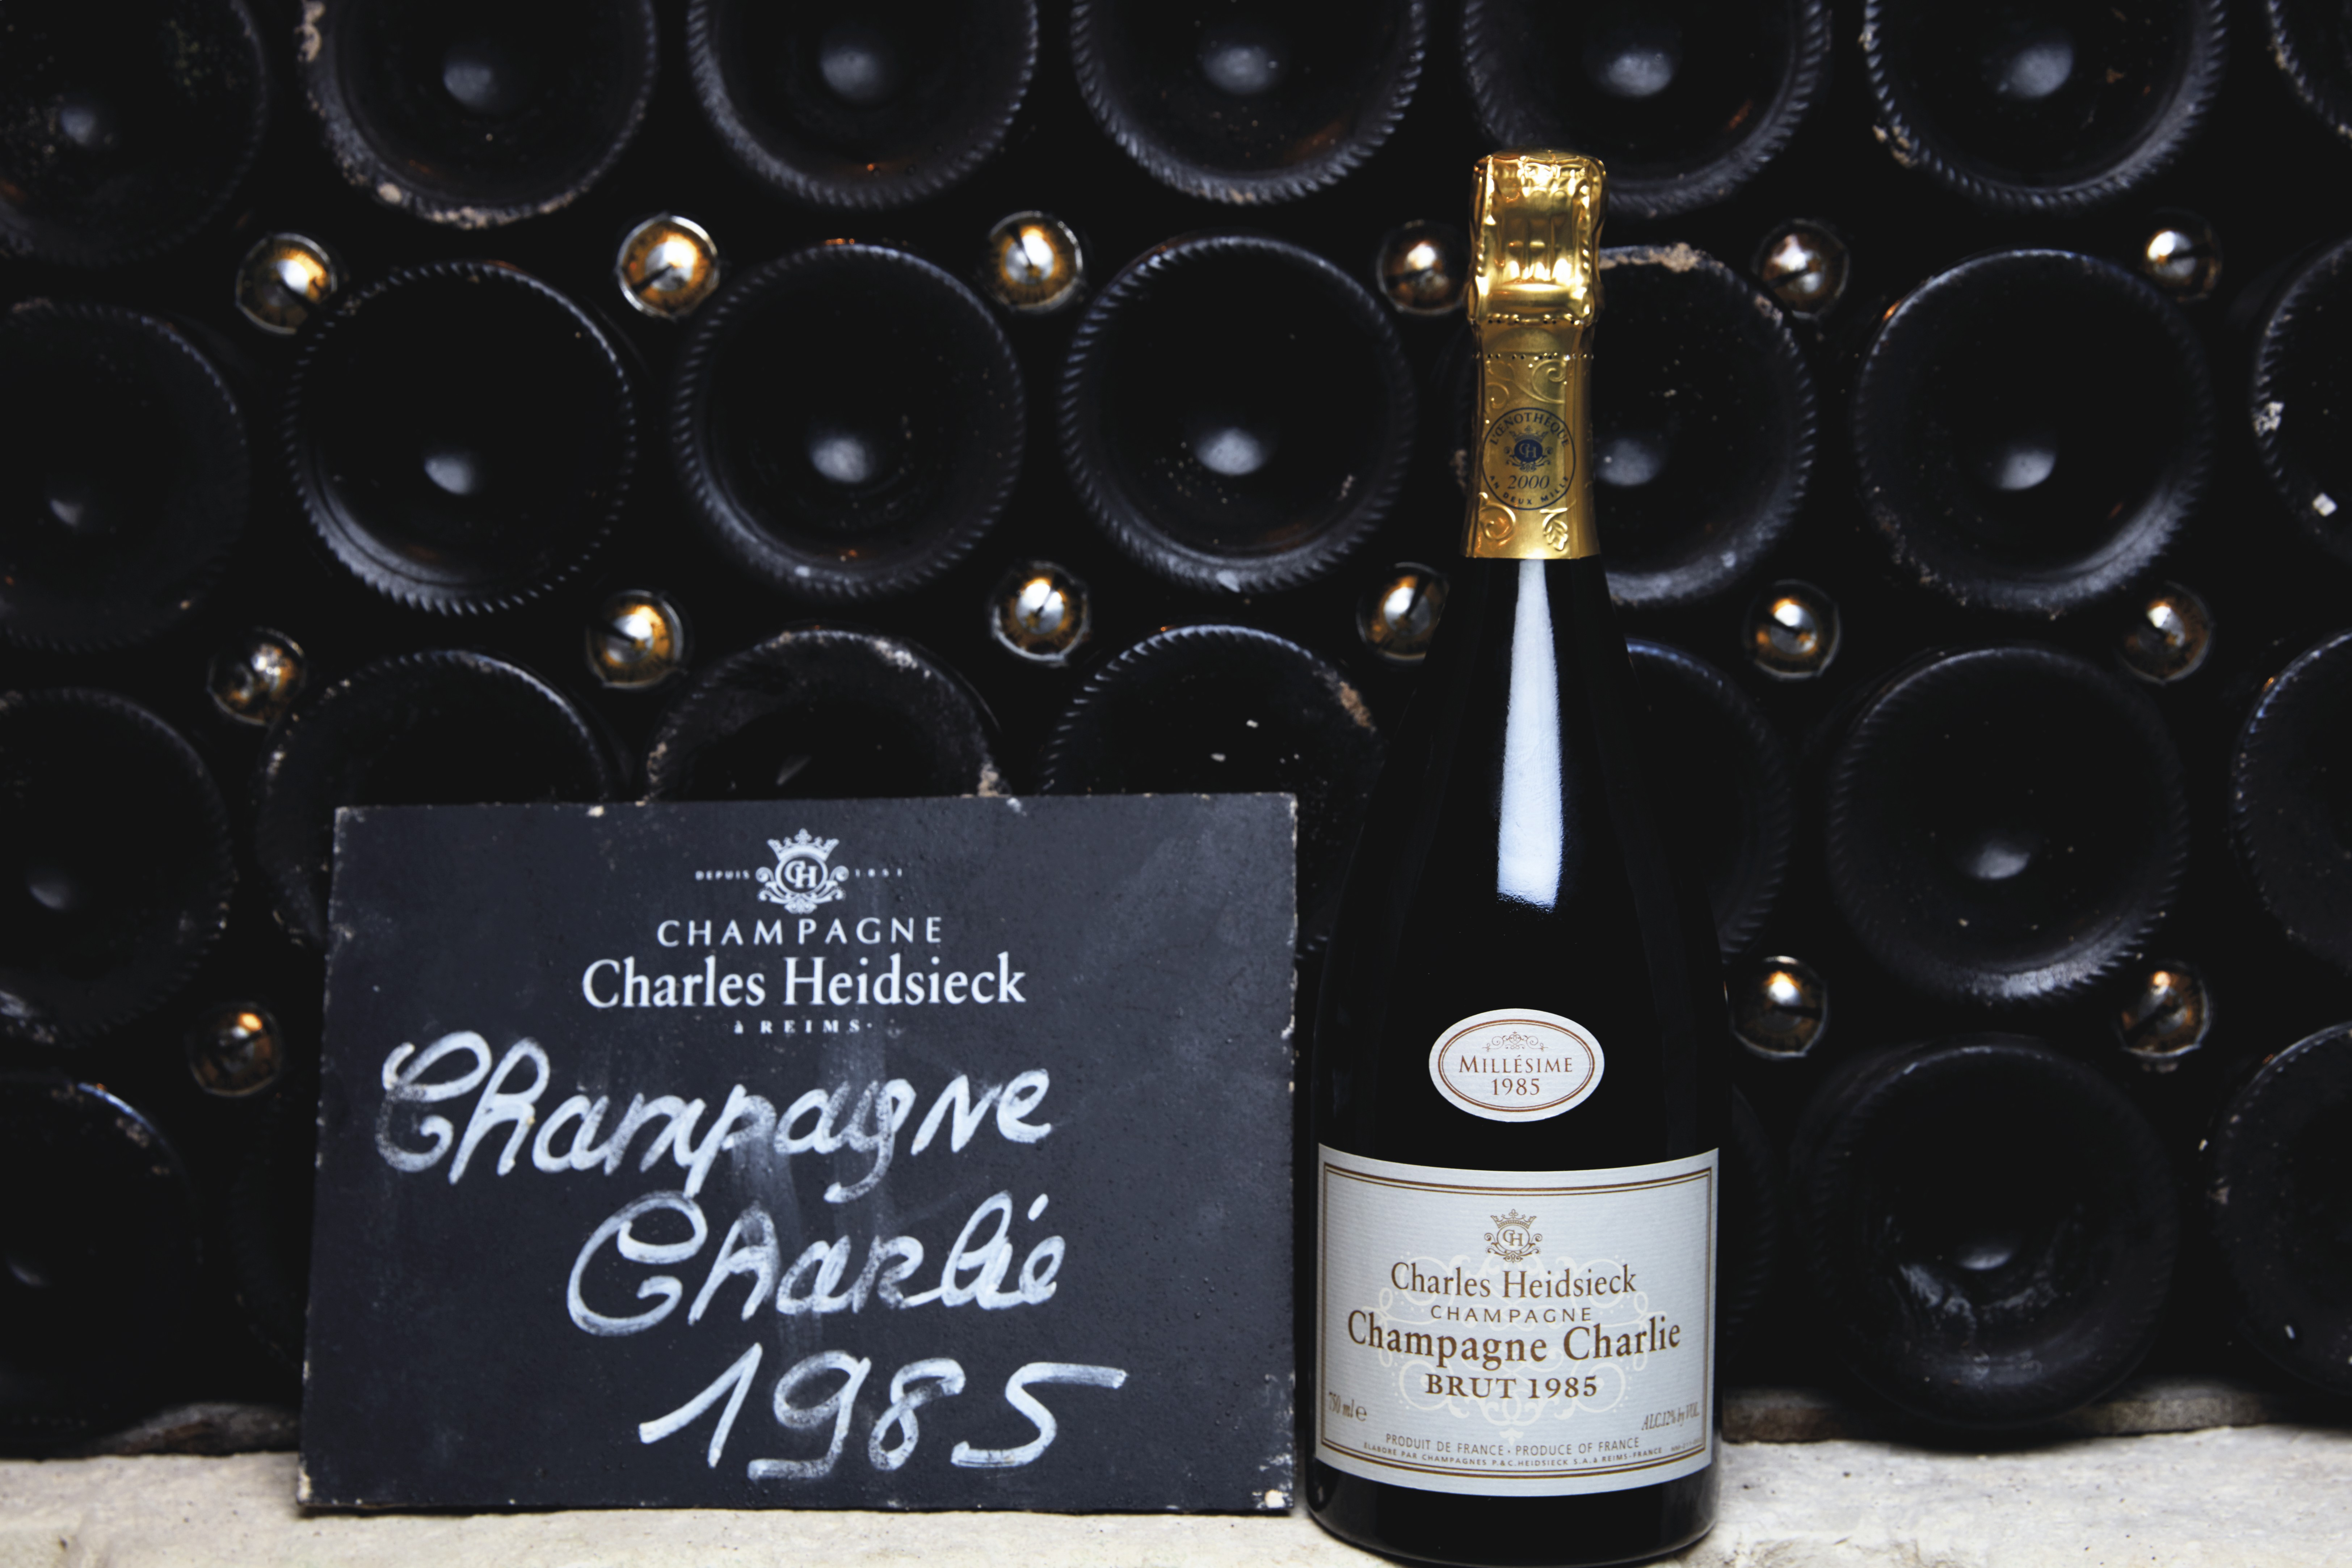 Charles Heidsieck, Champagne Charlie 1985